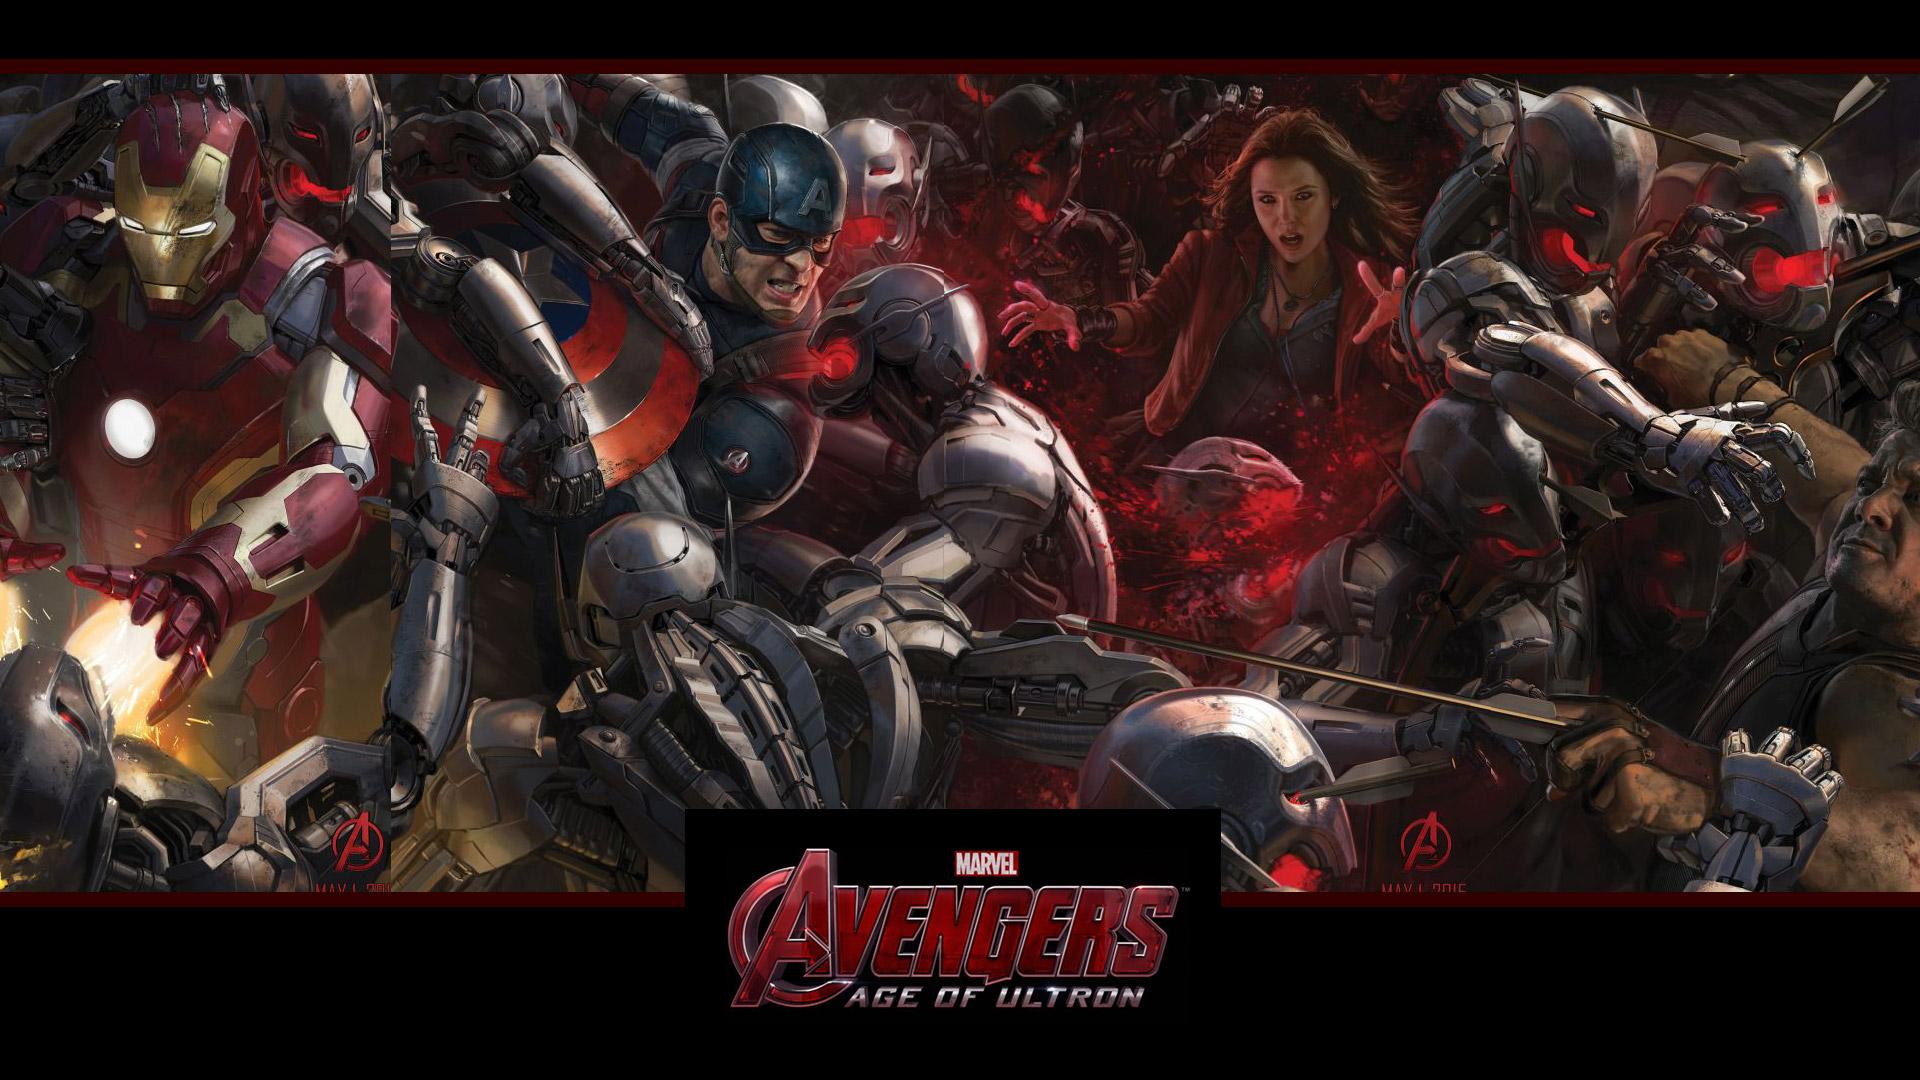 Avengers 2 Age of Ultron 2015 Desktop iPhone 6 Wallpapers HD 1920x1080